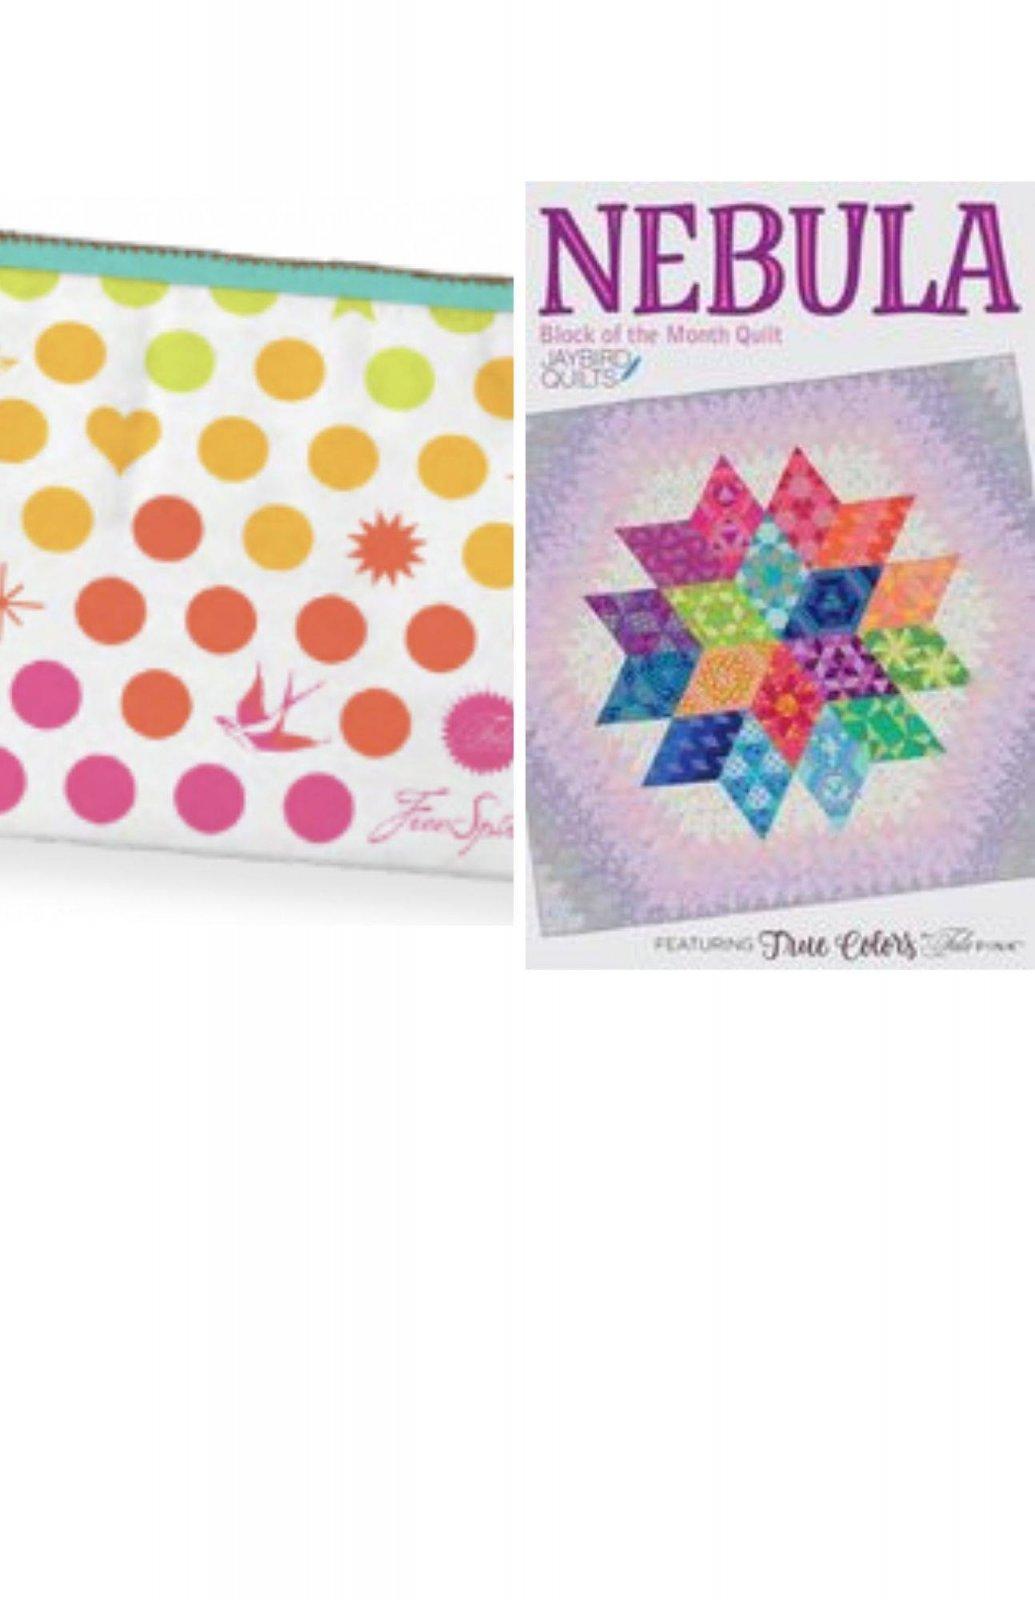 Nebula BOM includes SWAG! Kit 9